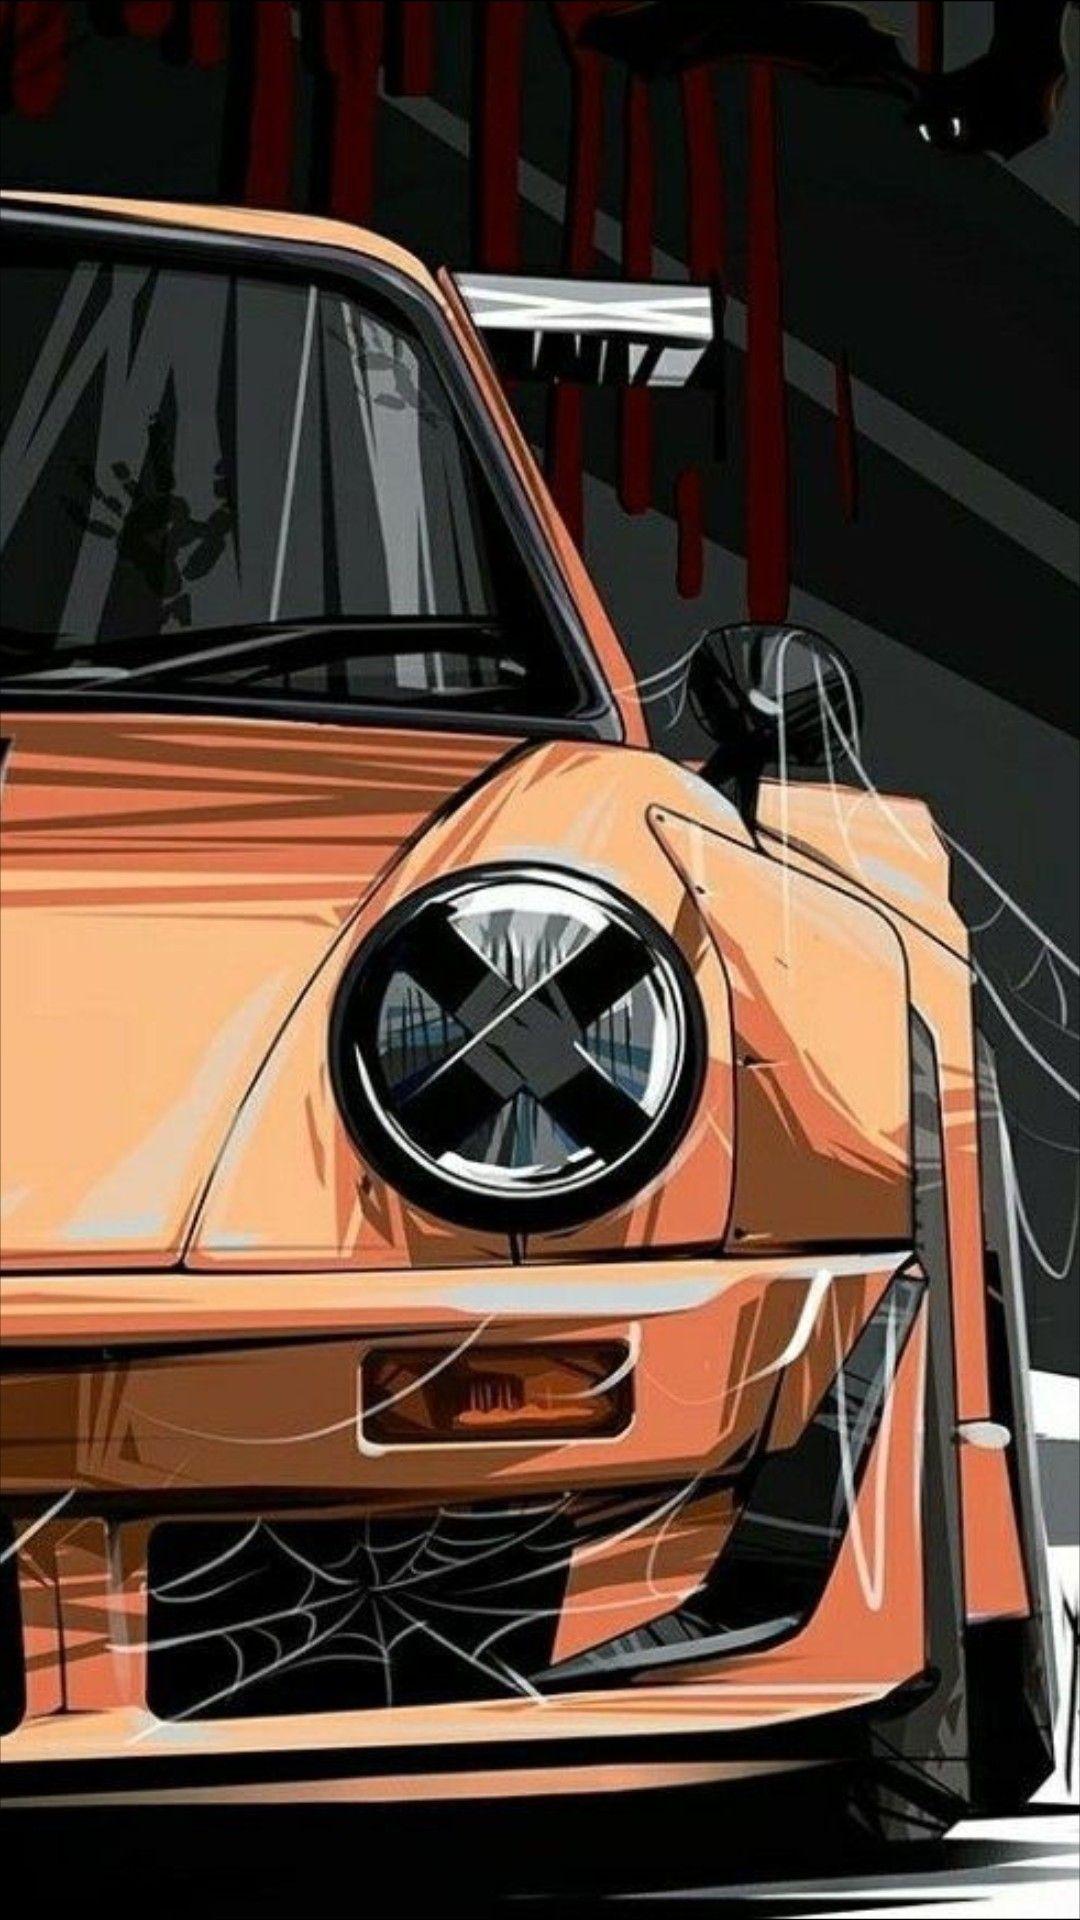 Porsche おしゃれまとめの人気アイデア Pinterest Kathy Meyer 改造車 車の絵 車の壁紙